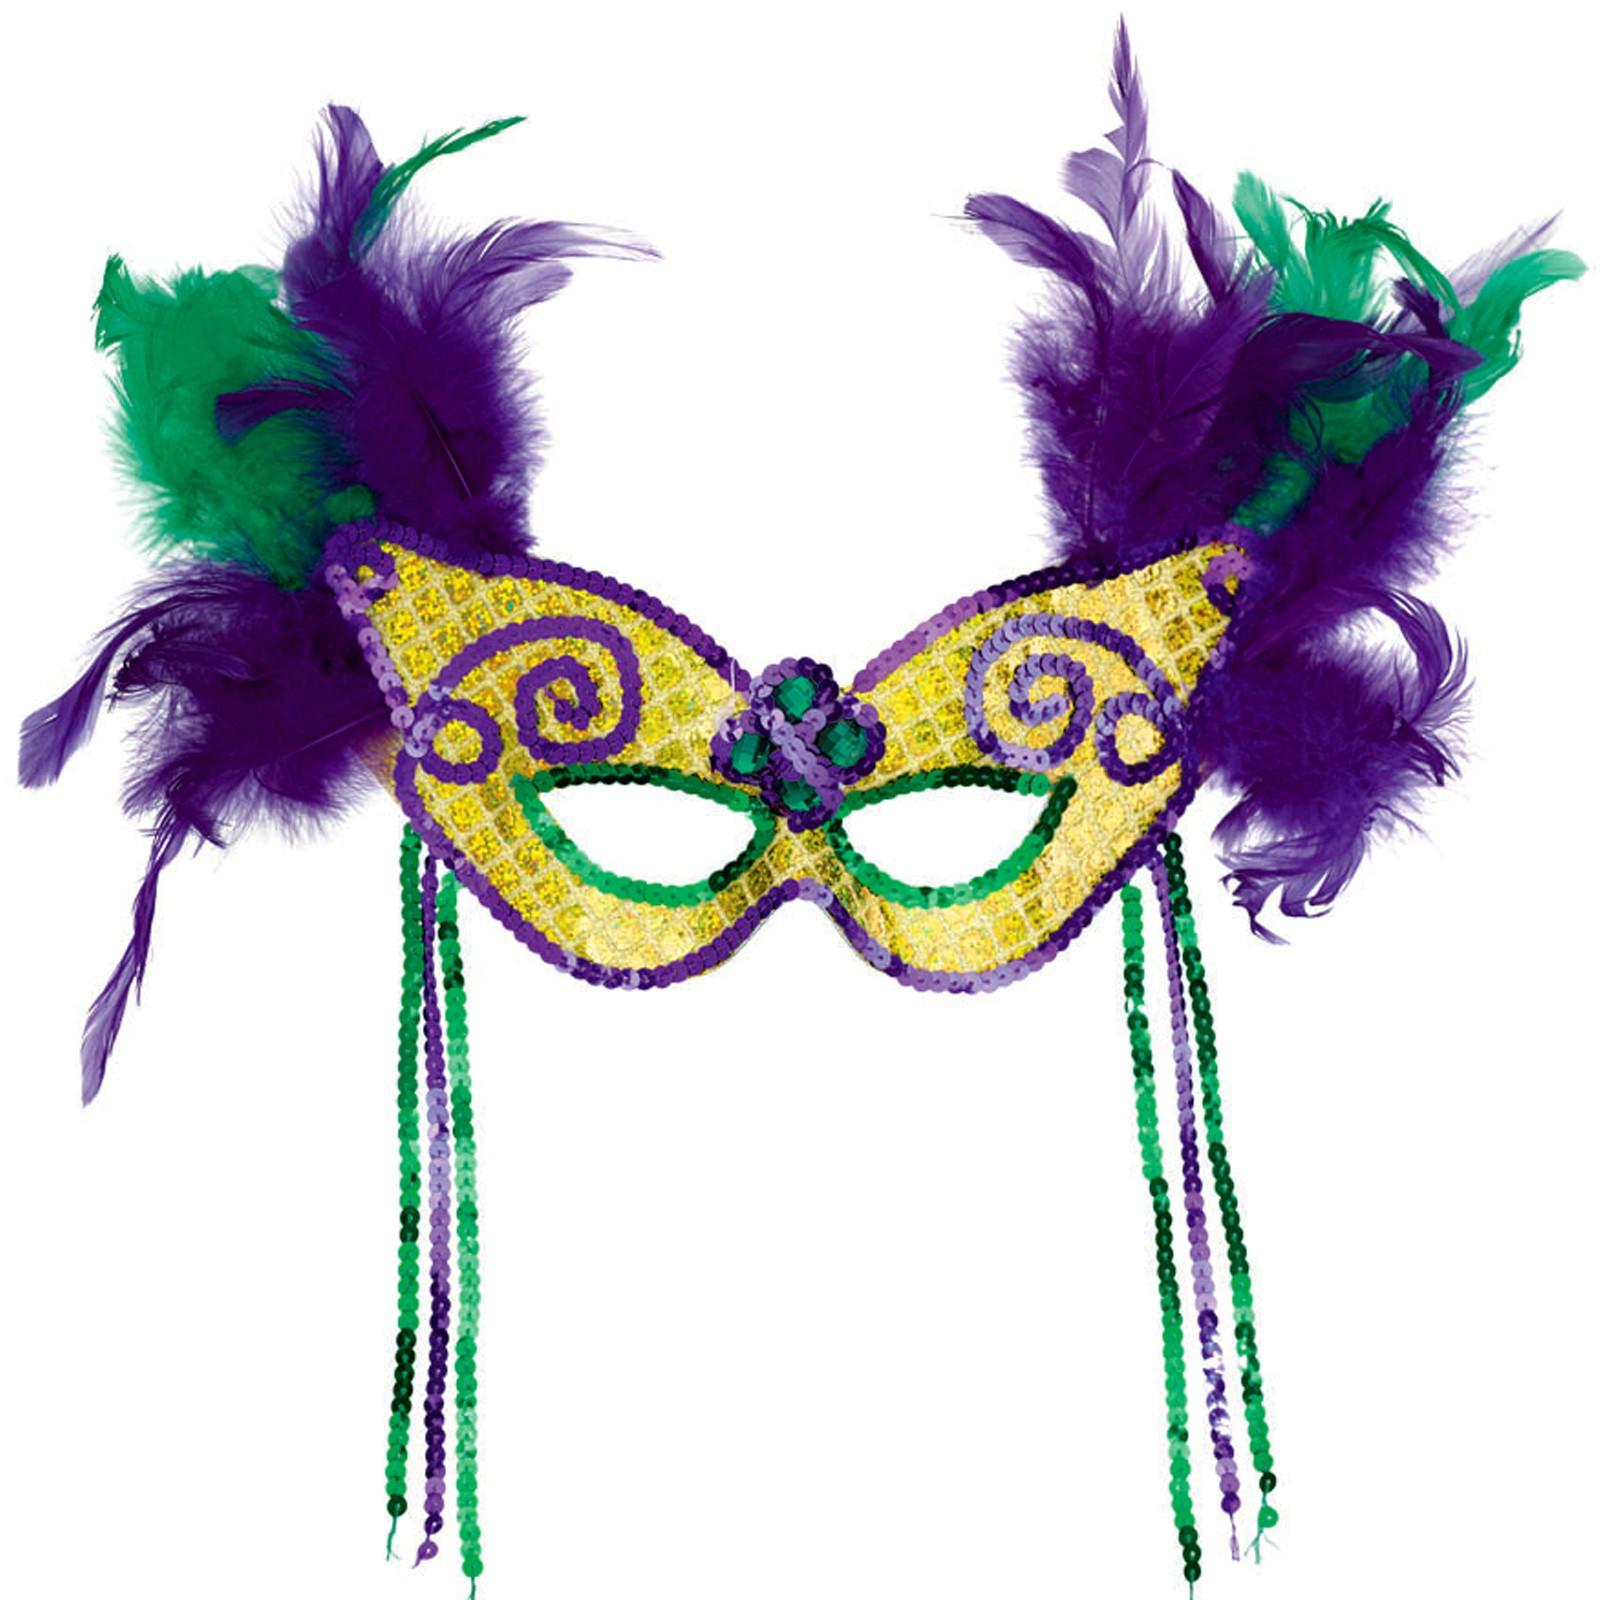 Free Mardi Gras Masks Images, Download Free Clip Art, Free.